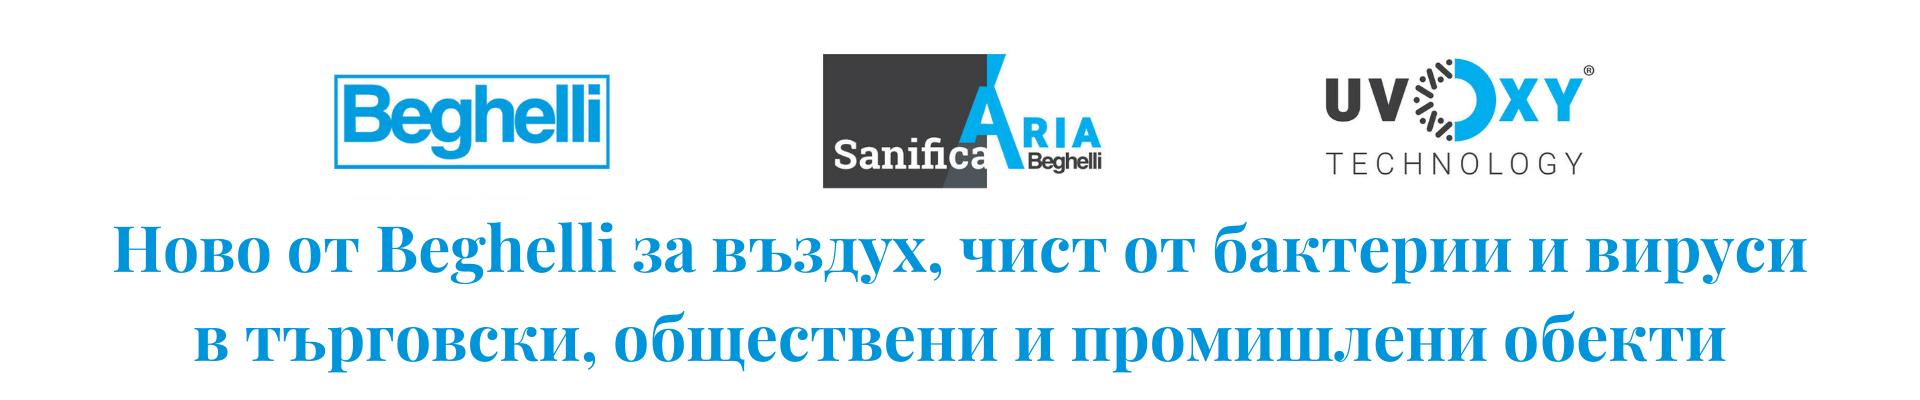 sanifica-aria-200-connect